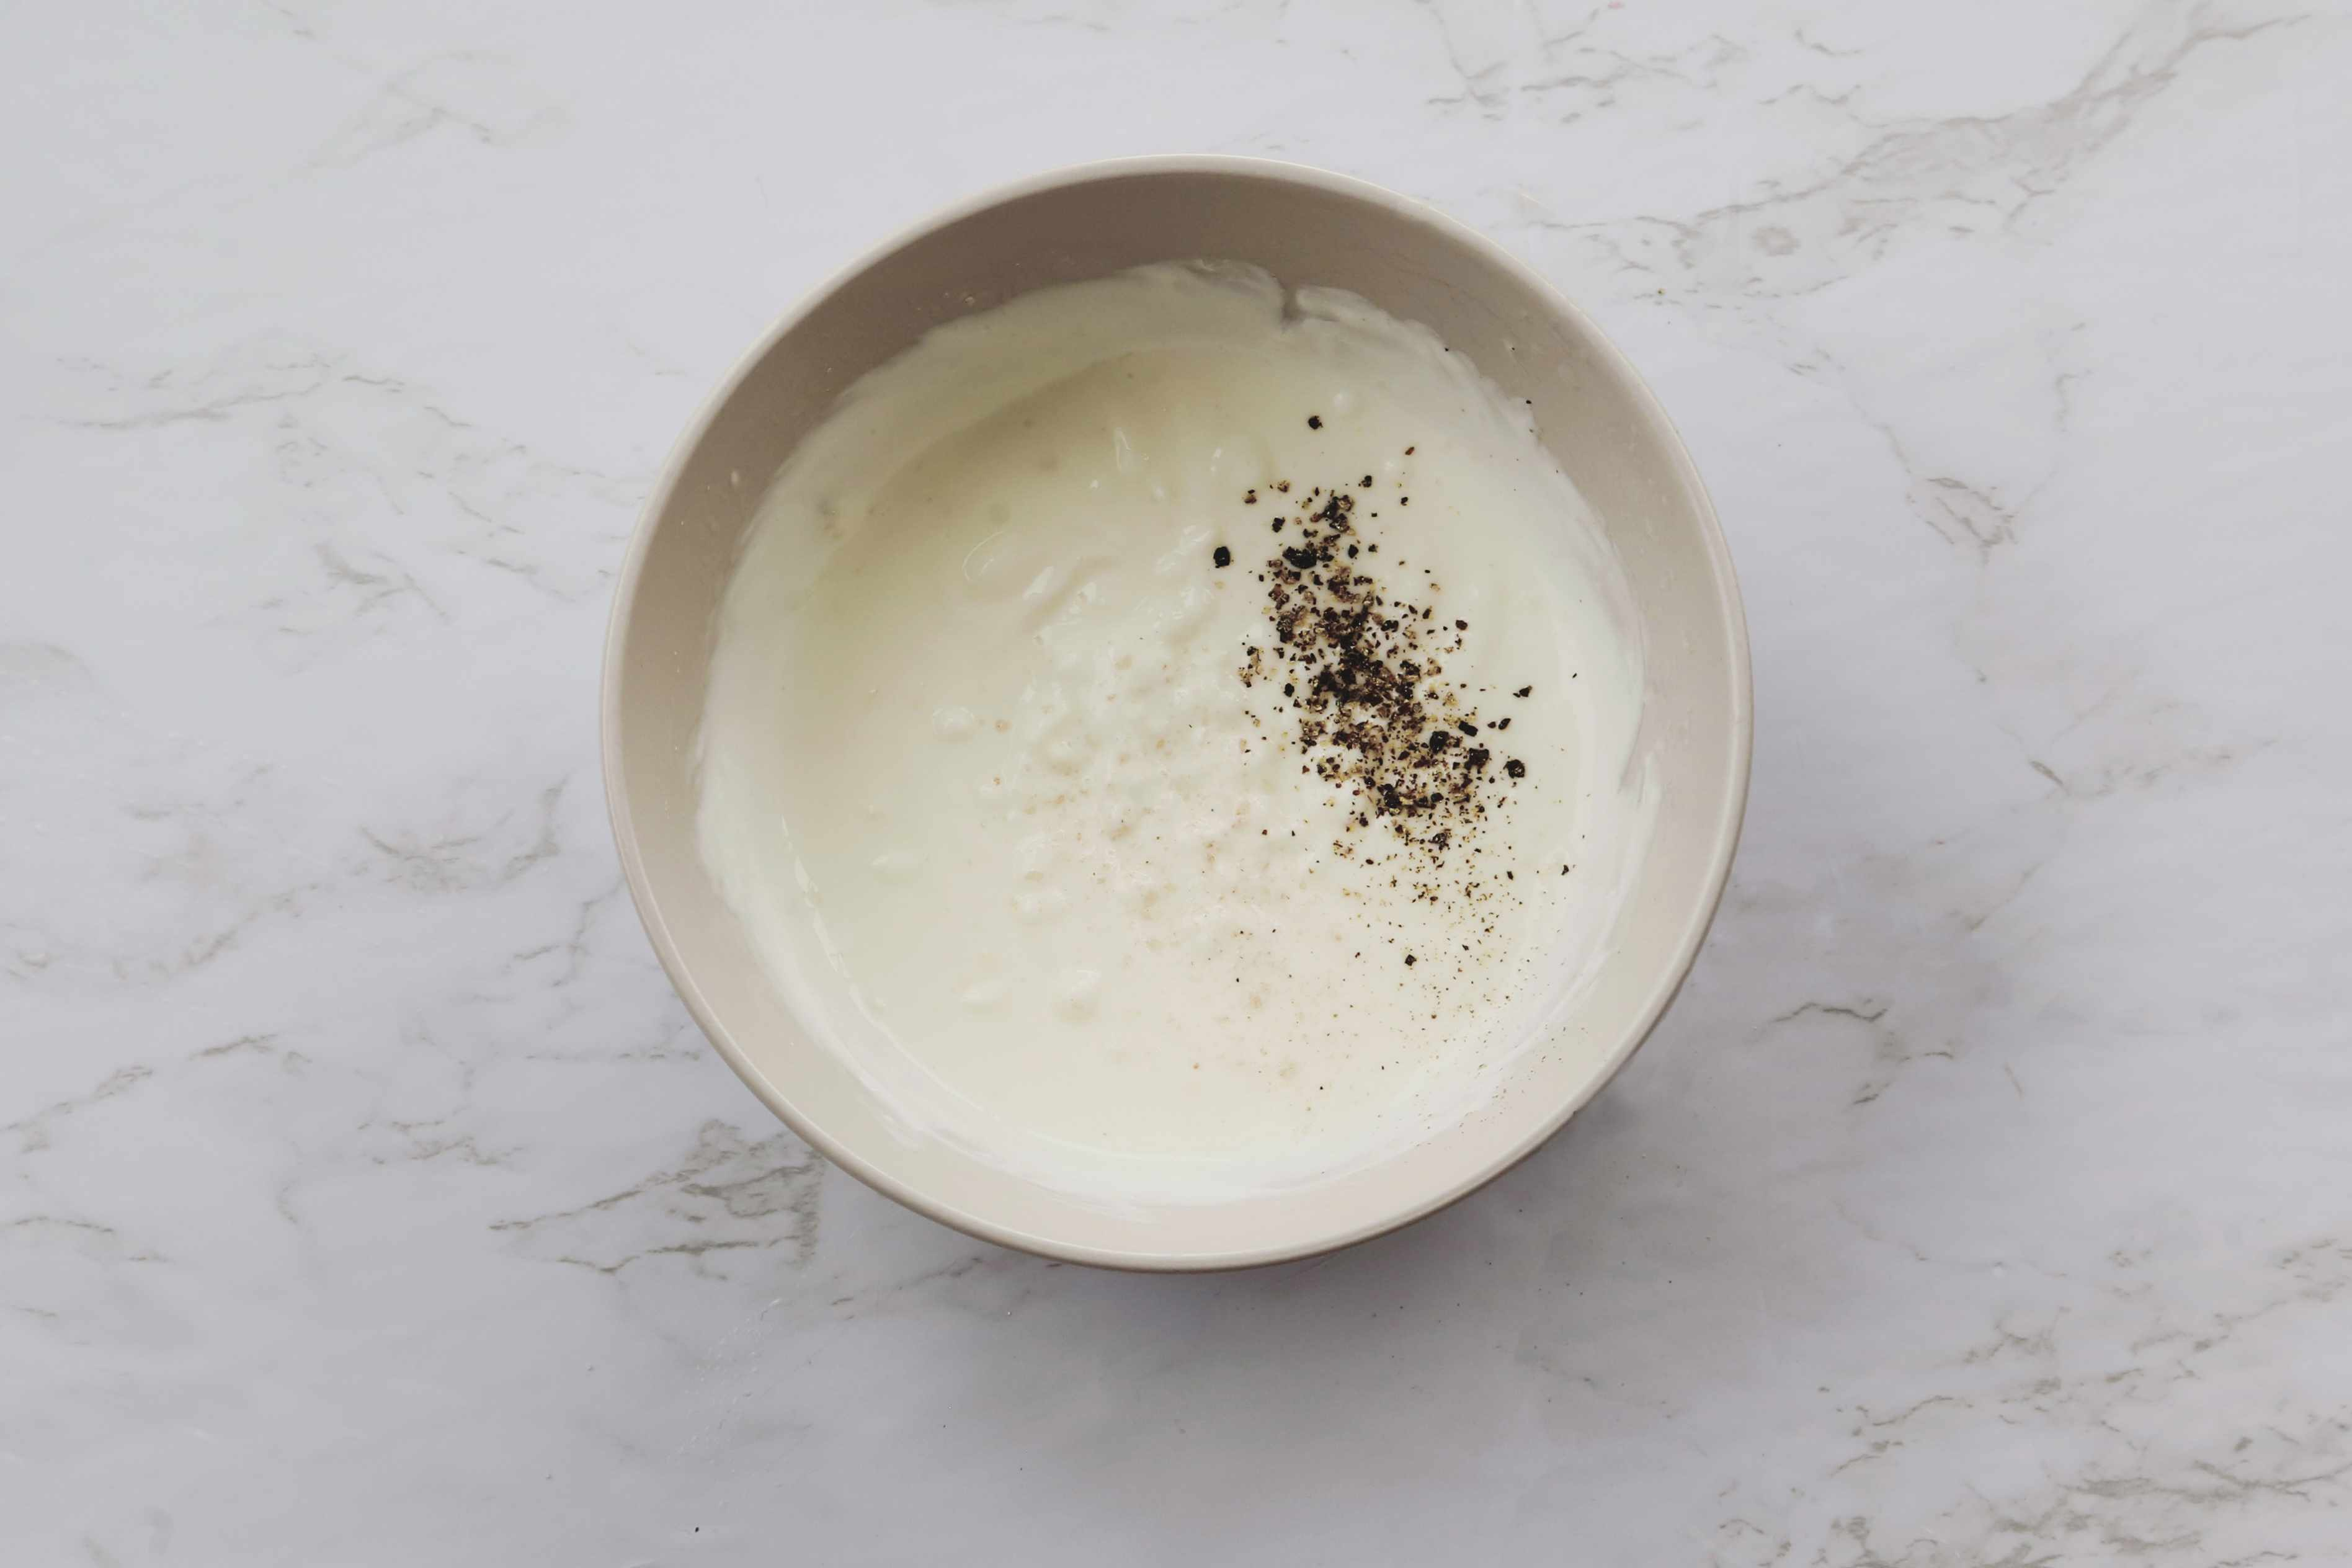 salt and pepper added to the garlic, yogurt and lemon mixture, Garlic Yogurt Salad Dressing